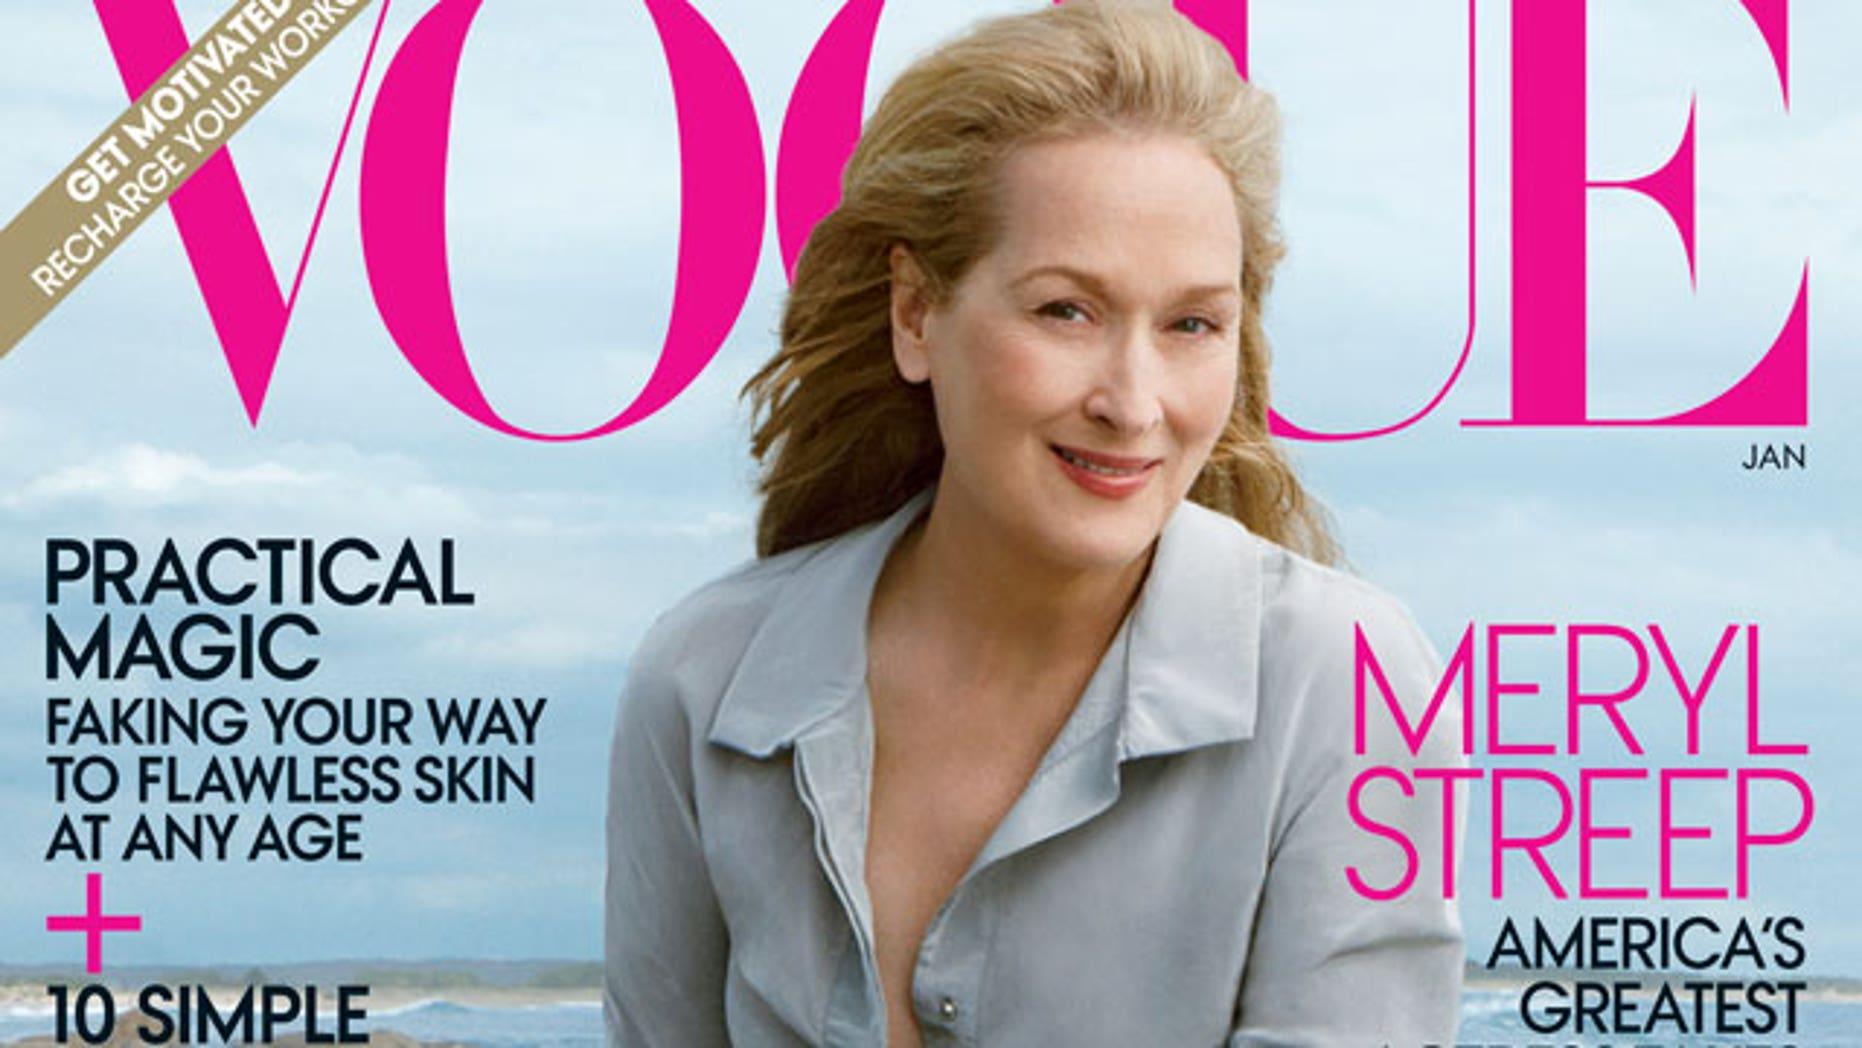 Meryl Strep on the January cover of Vogue magazine.